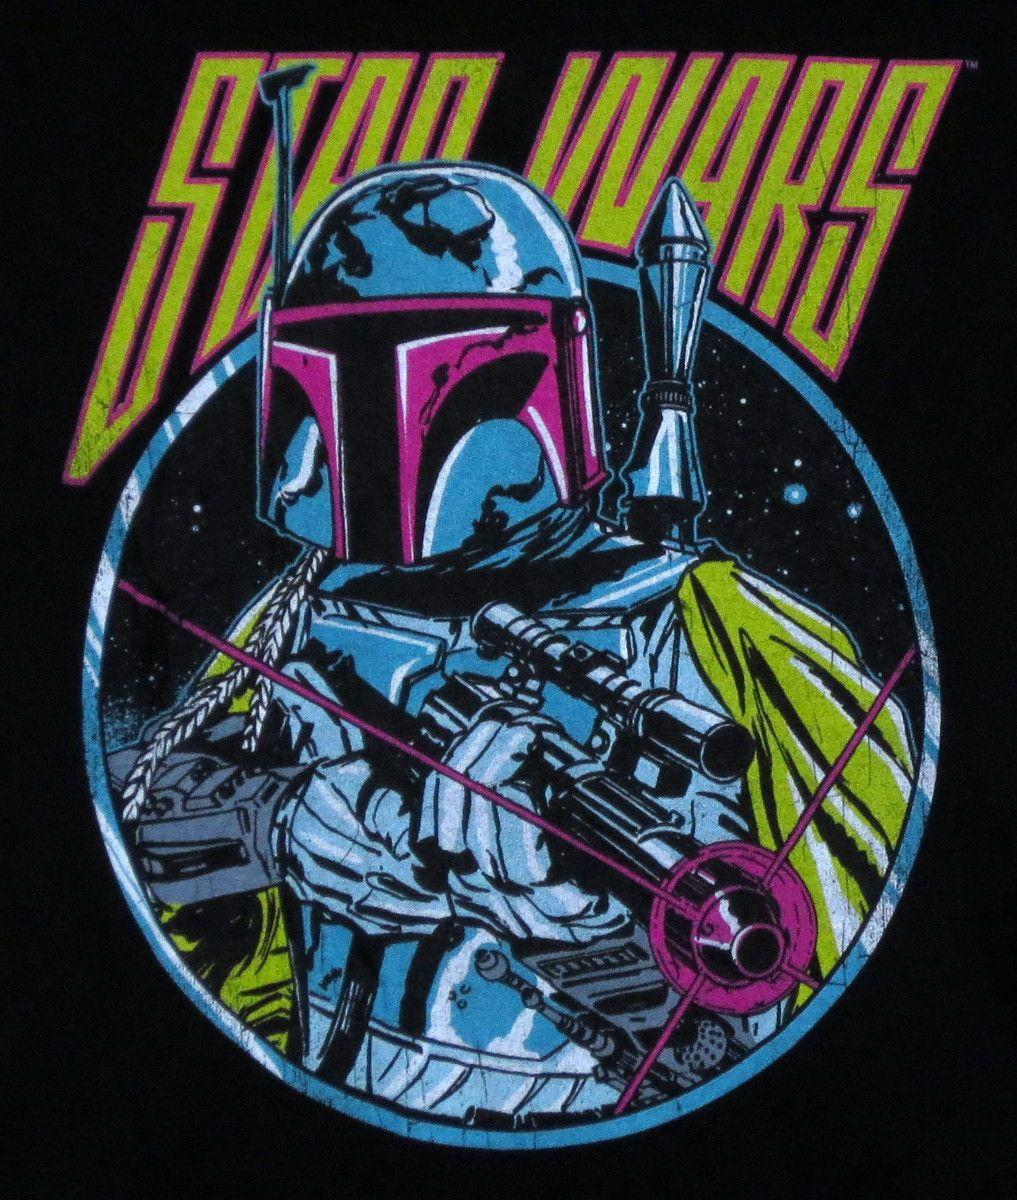 Star Wars T-Shirt - Retro 80s Boba Fett - NerdKungFu